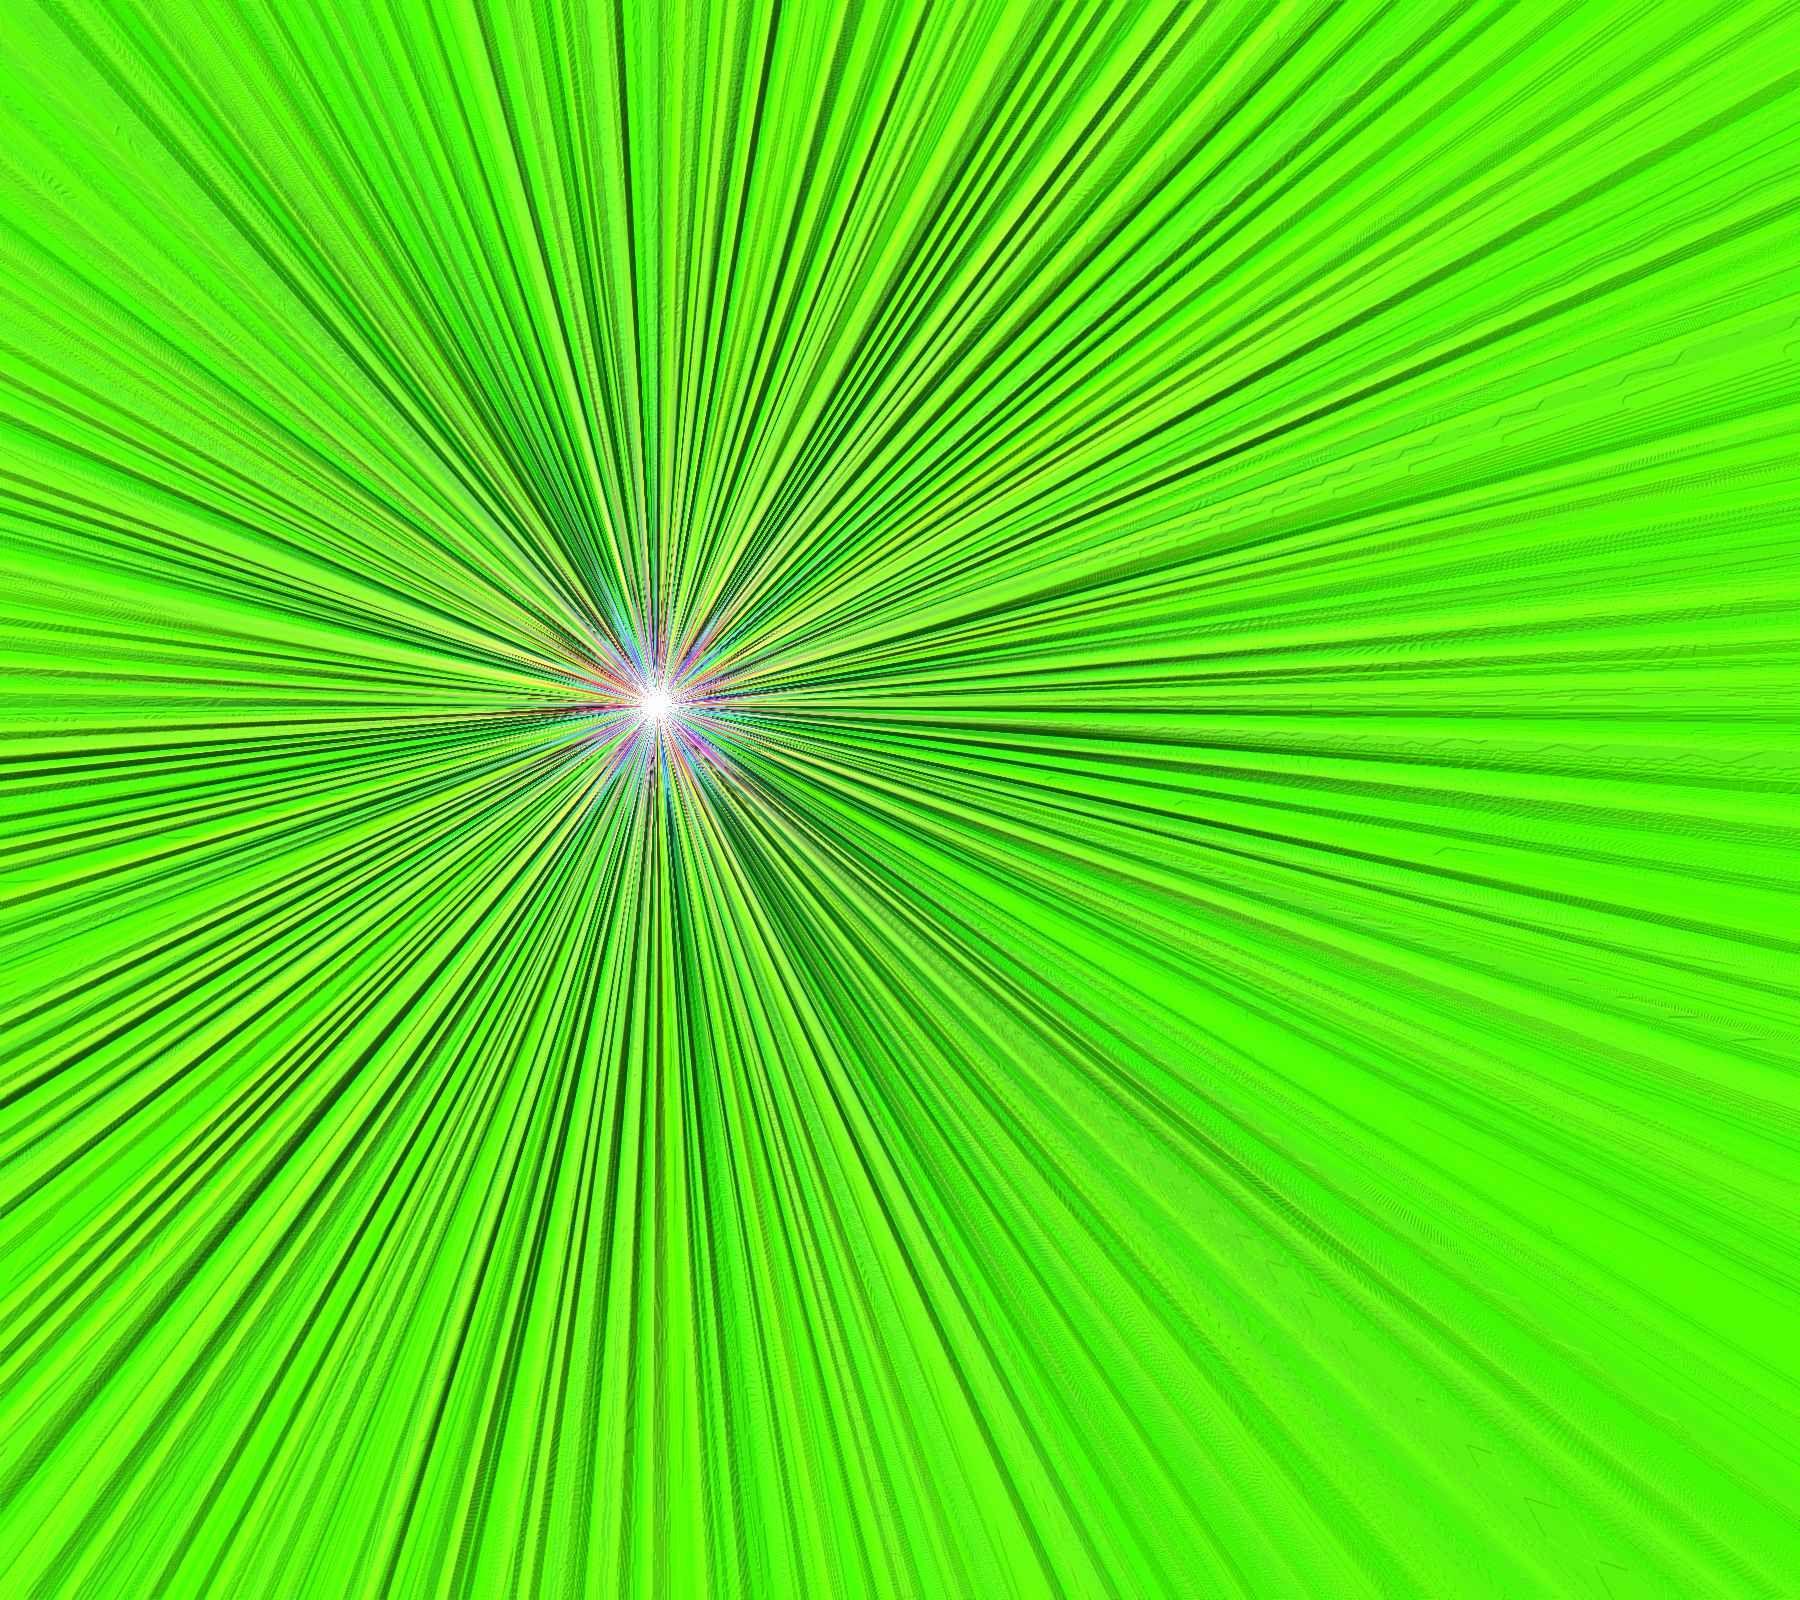 Wallpaper dots pink hexagon polka green 00ff00 ff69b4